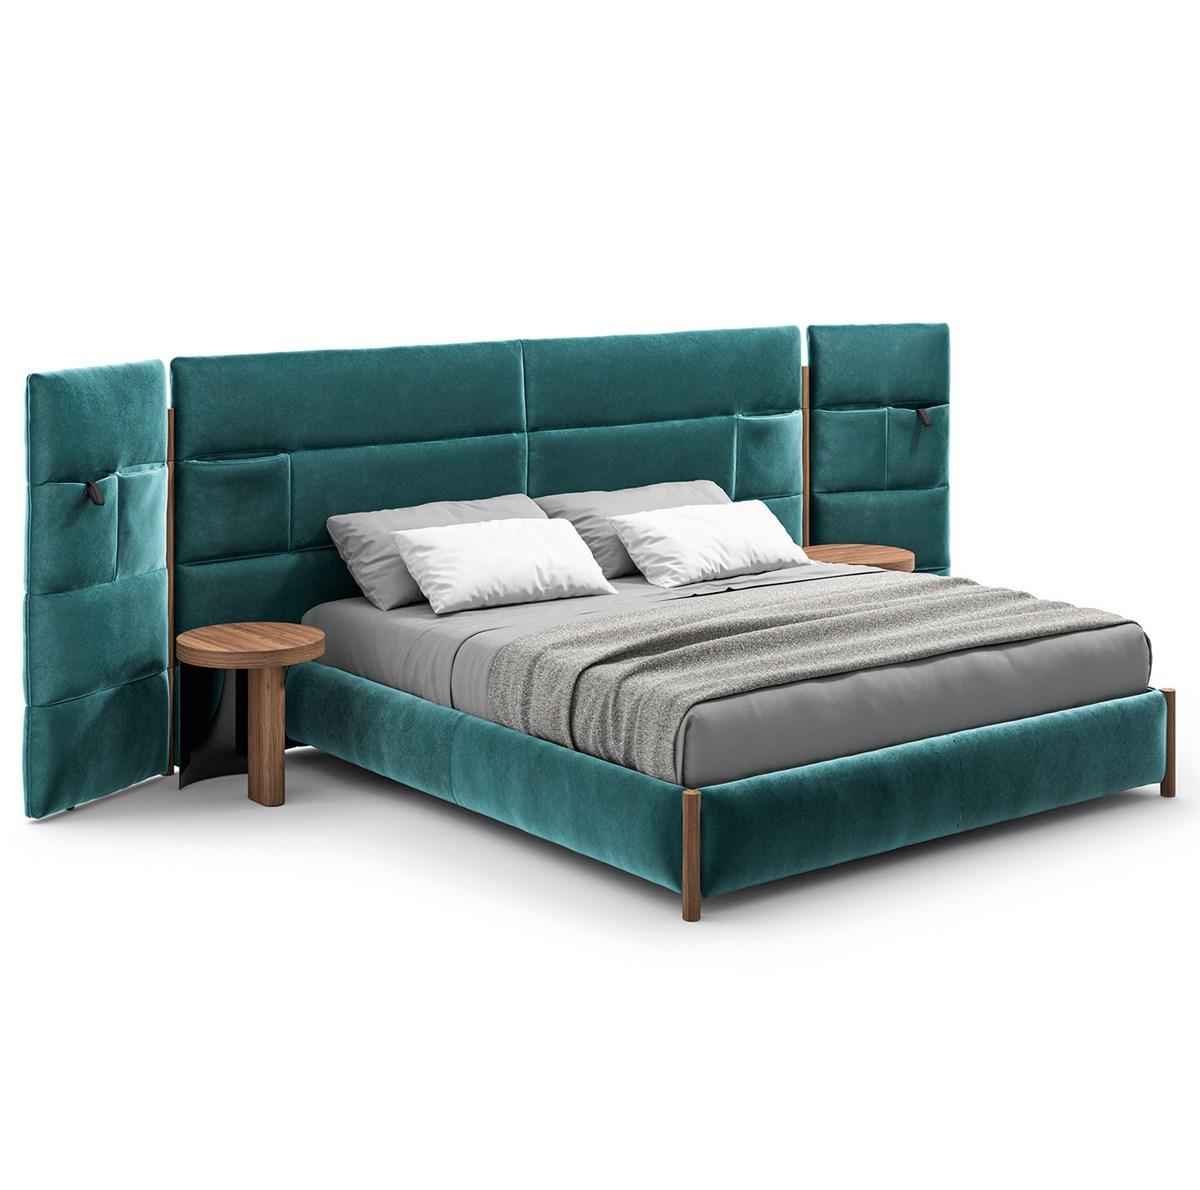 Bio Mbo Bed Cassina